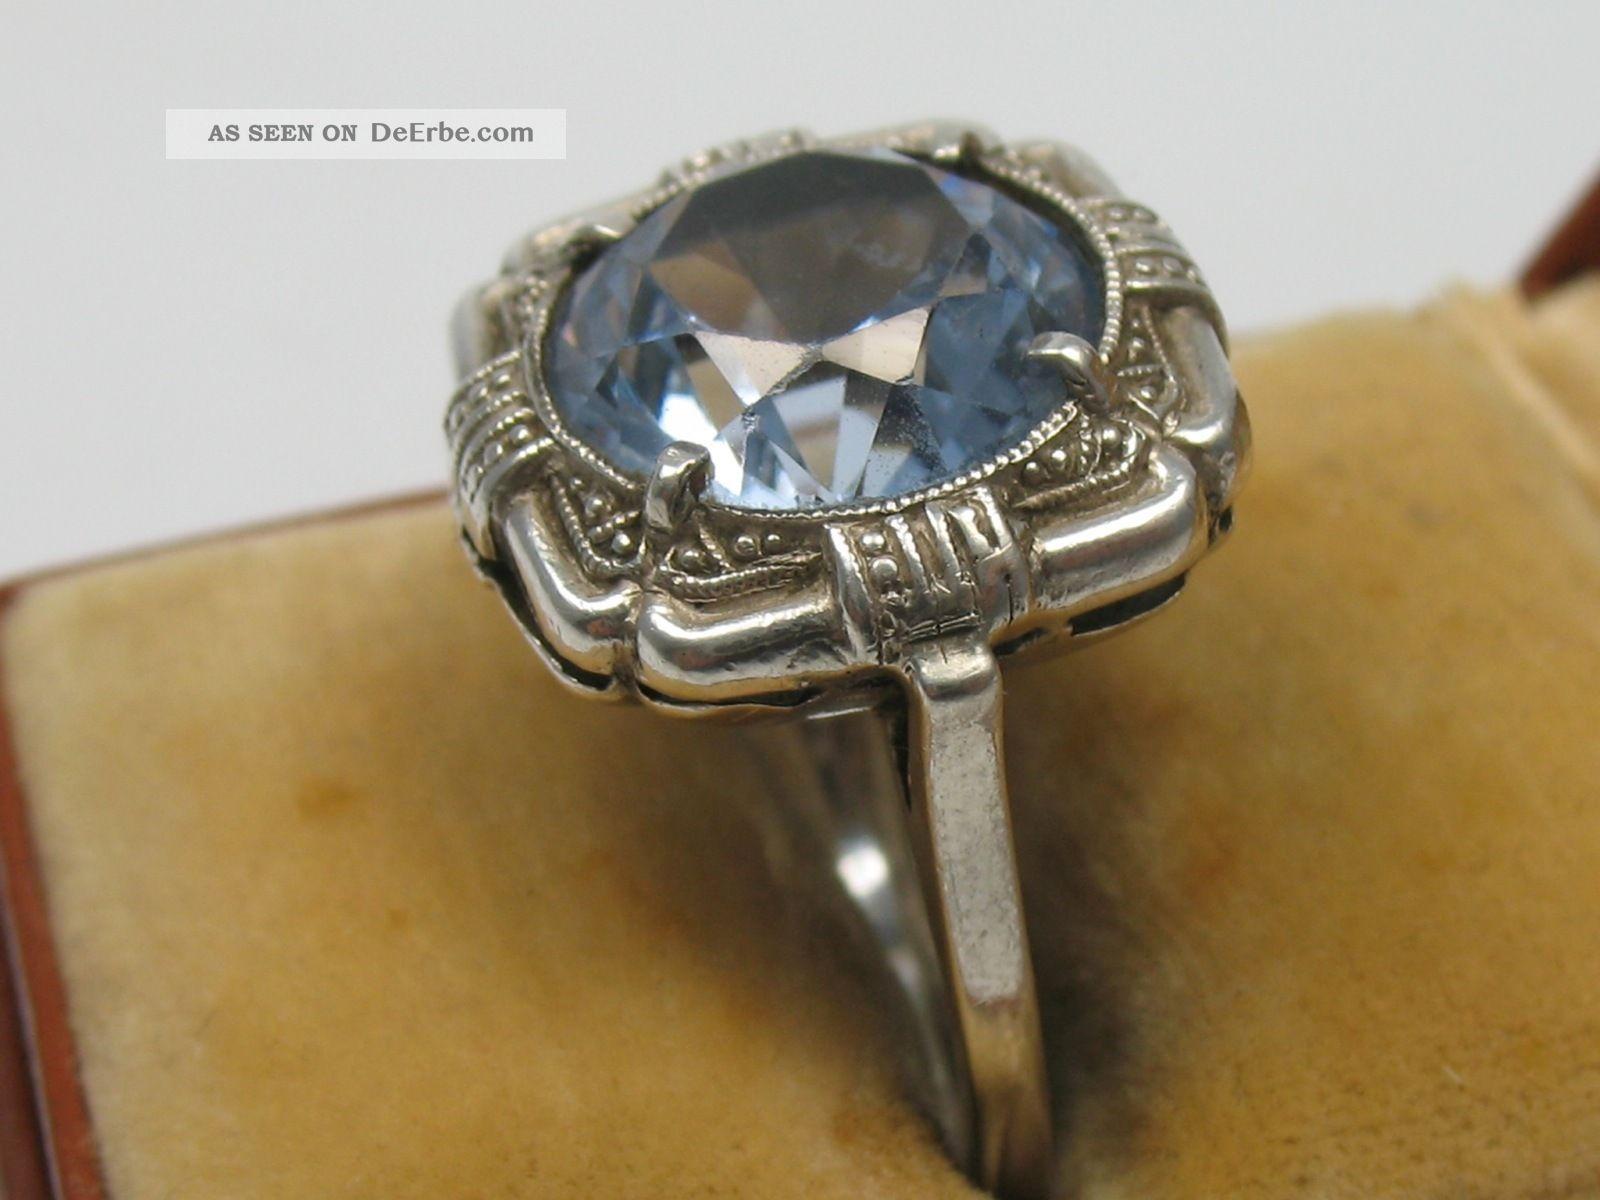 Antikschmuck Schmuck Accessoires Ringe Antiquitäten